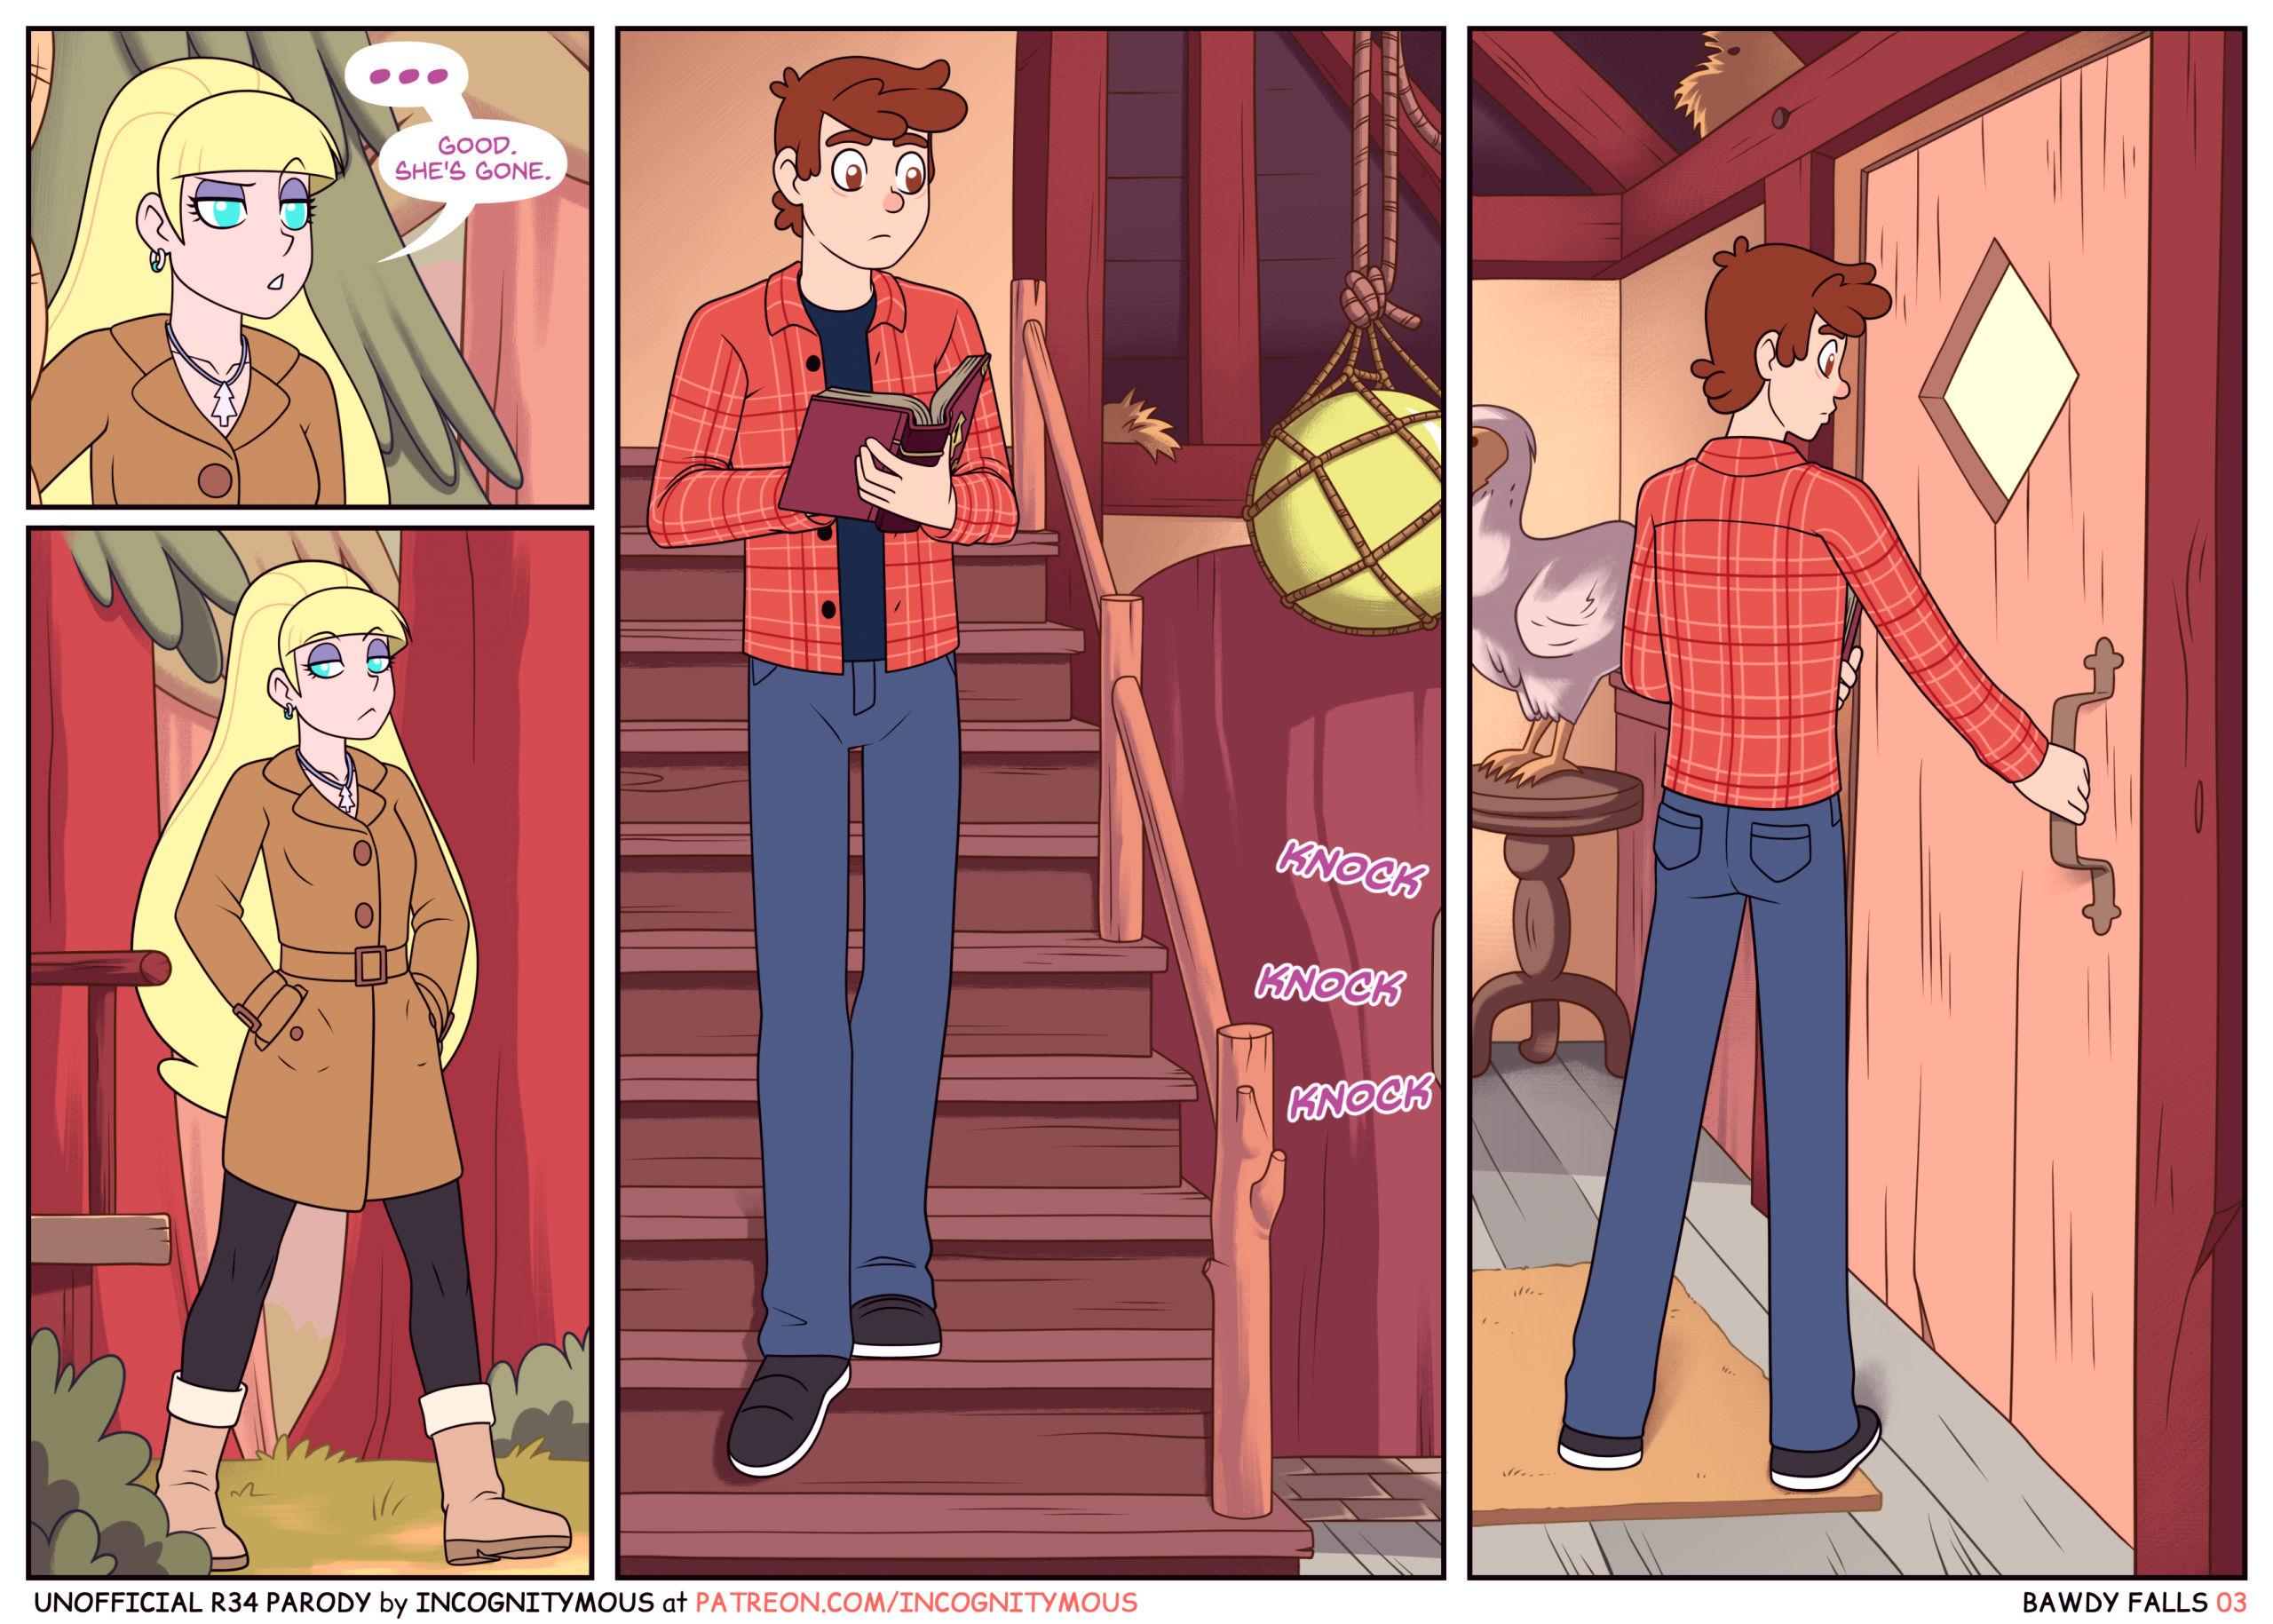 Bawdy falls porn comic picture 003